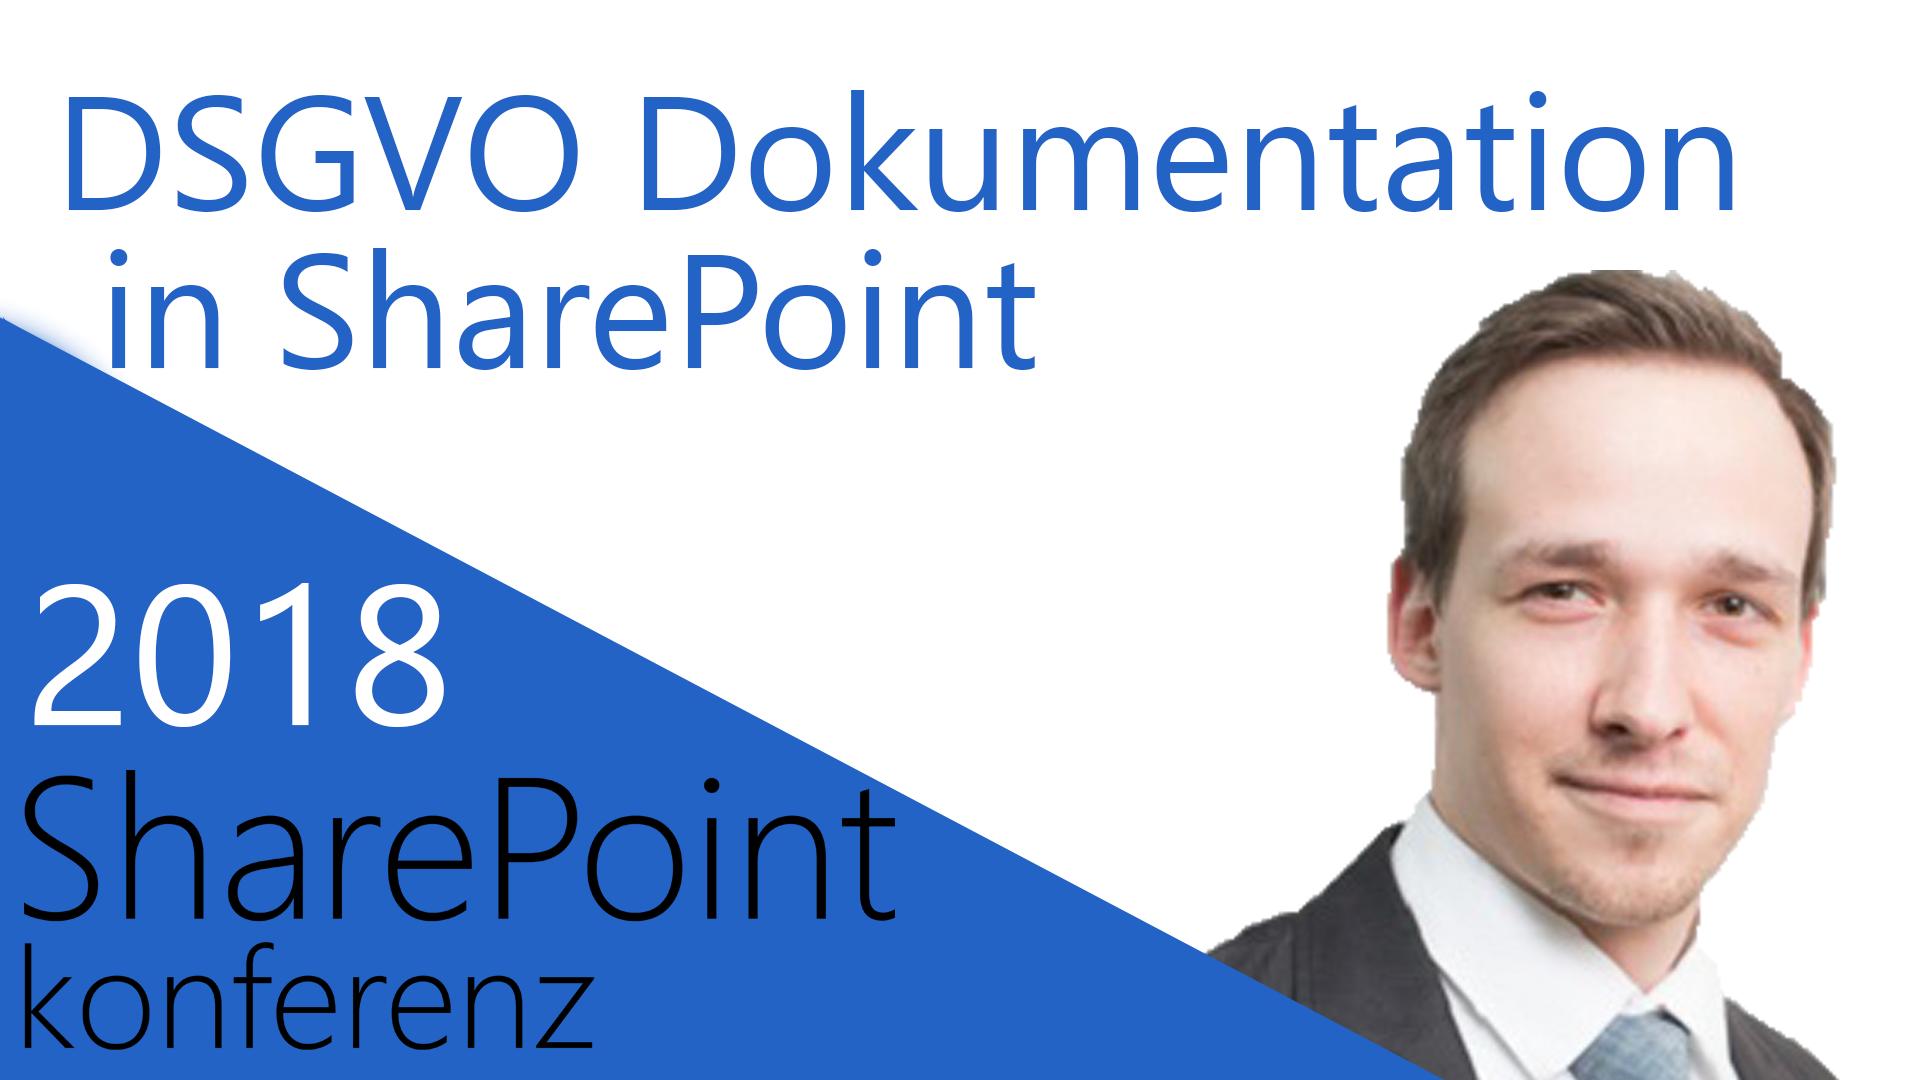 2018/SharePointKonferenz/dsgvo